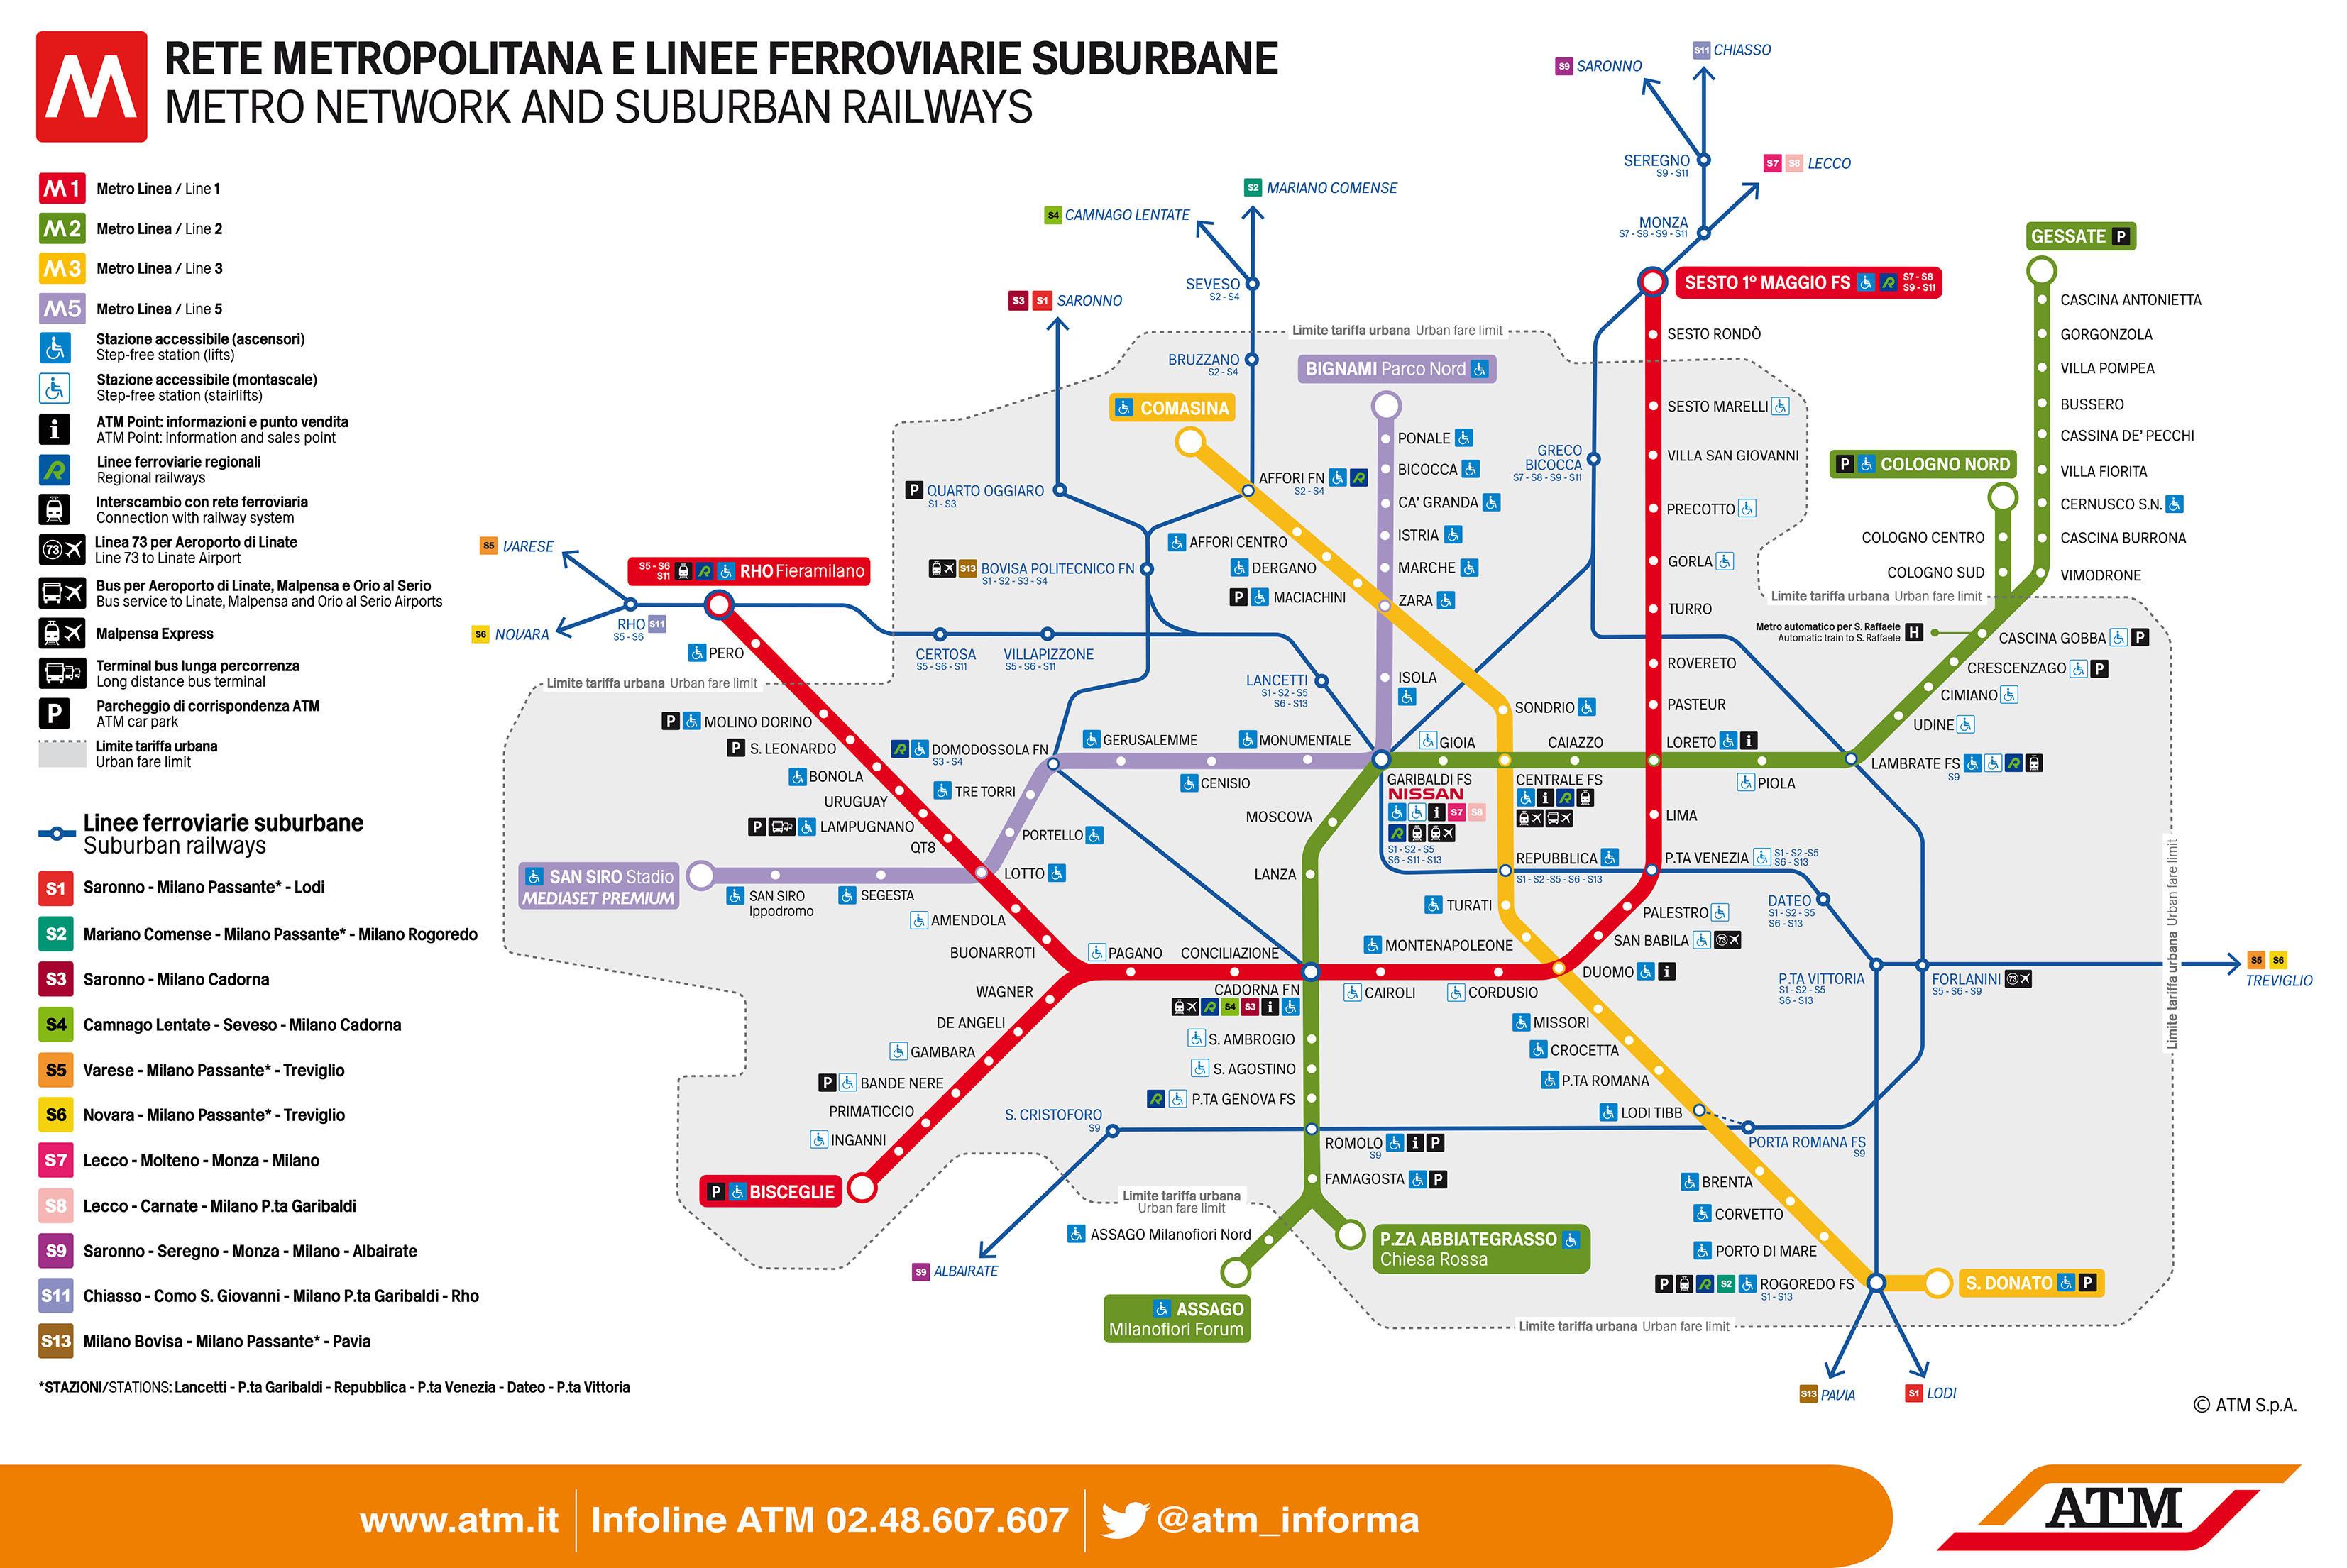 New metro line 4 in Milan? - Rick Steves Travel Forum